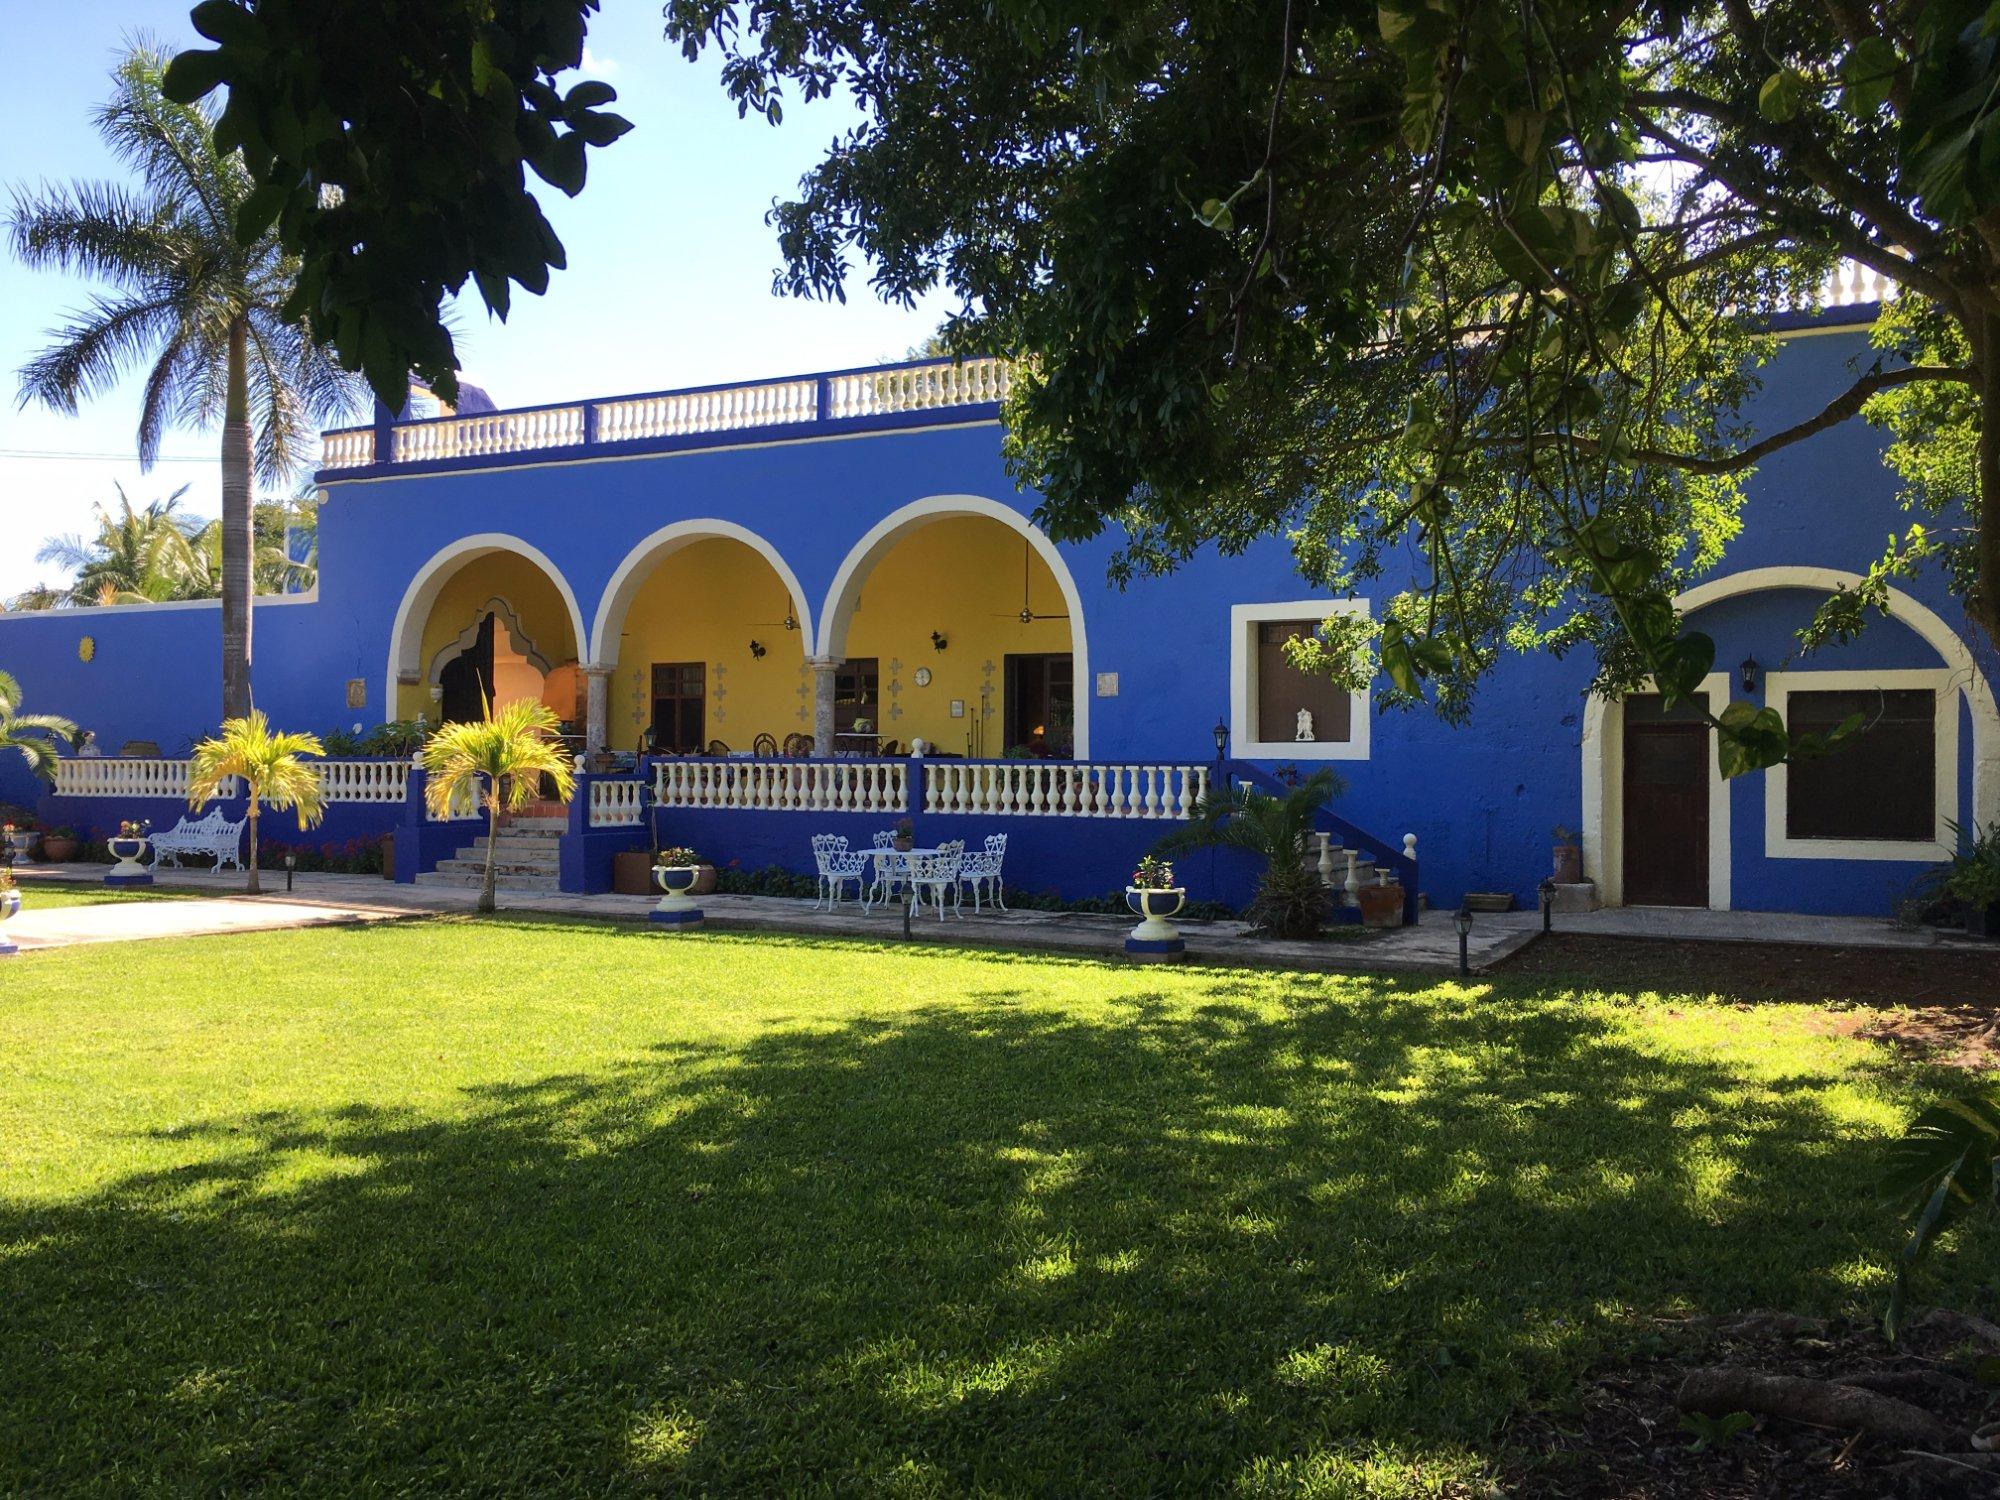 Hacienda San Pedro Nohpat